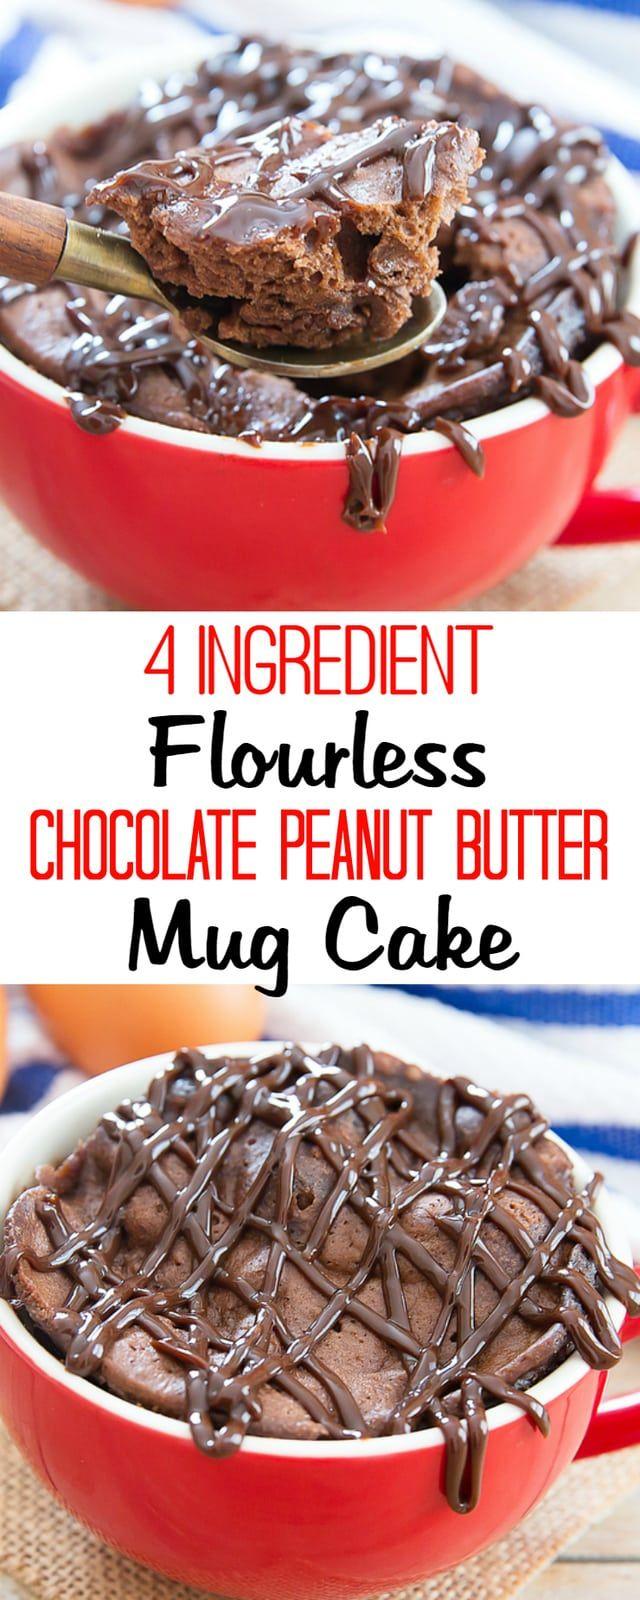 4 Ingredient Chocolate Peanut Butter Mug Cake | Recipe ...